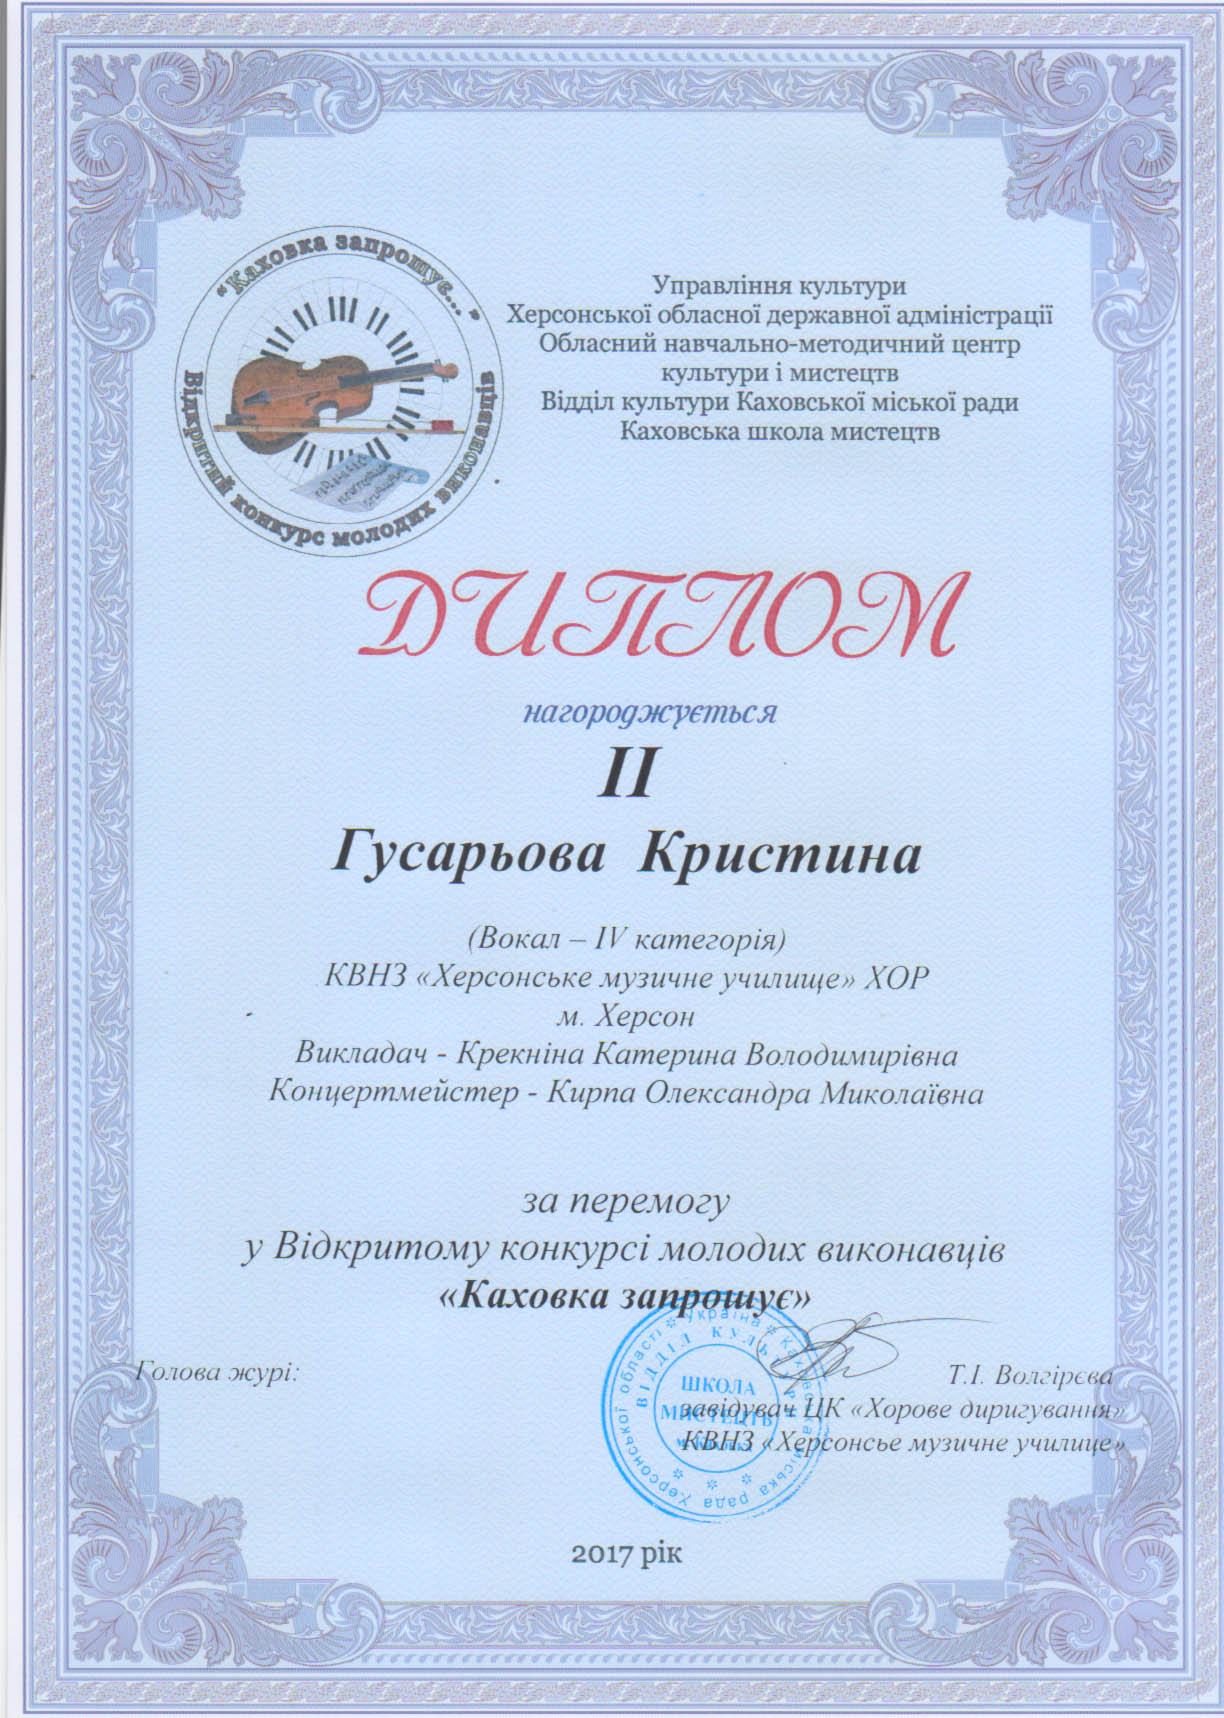 IГусарьоваG